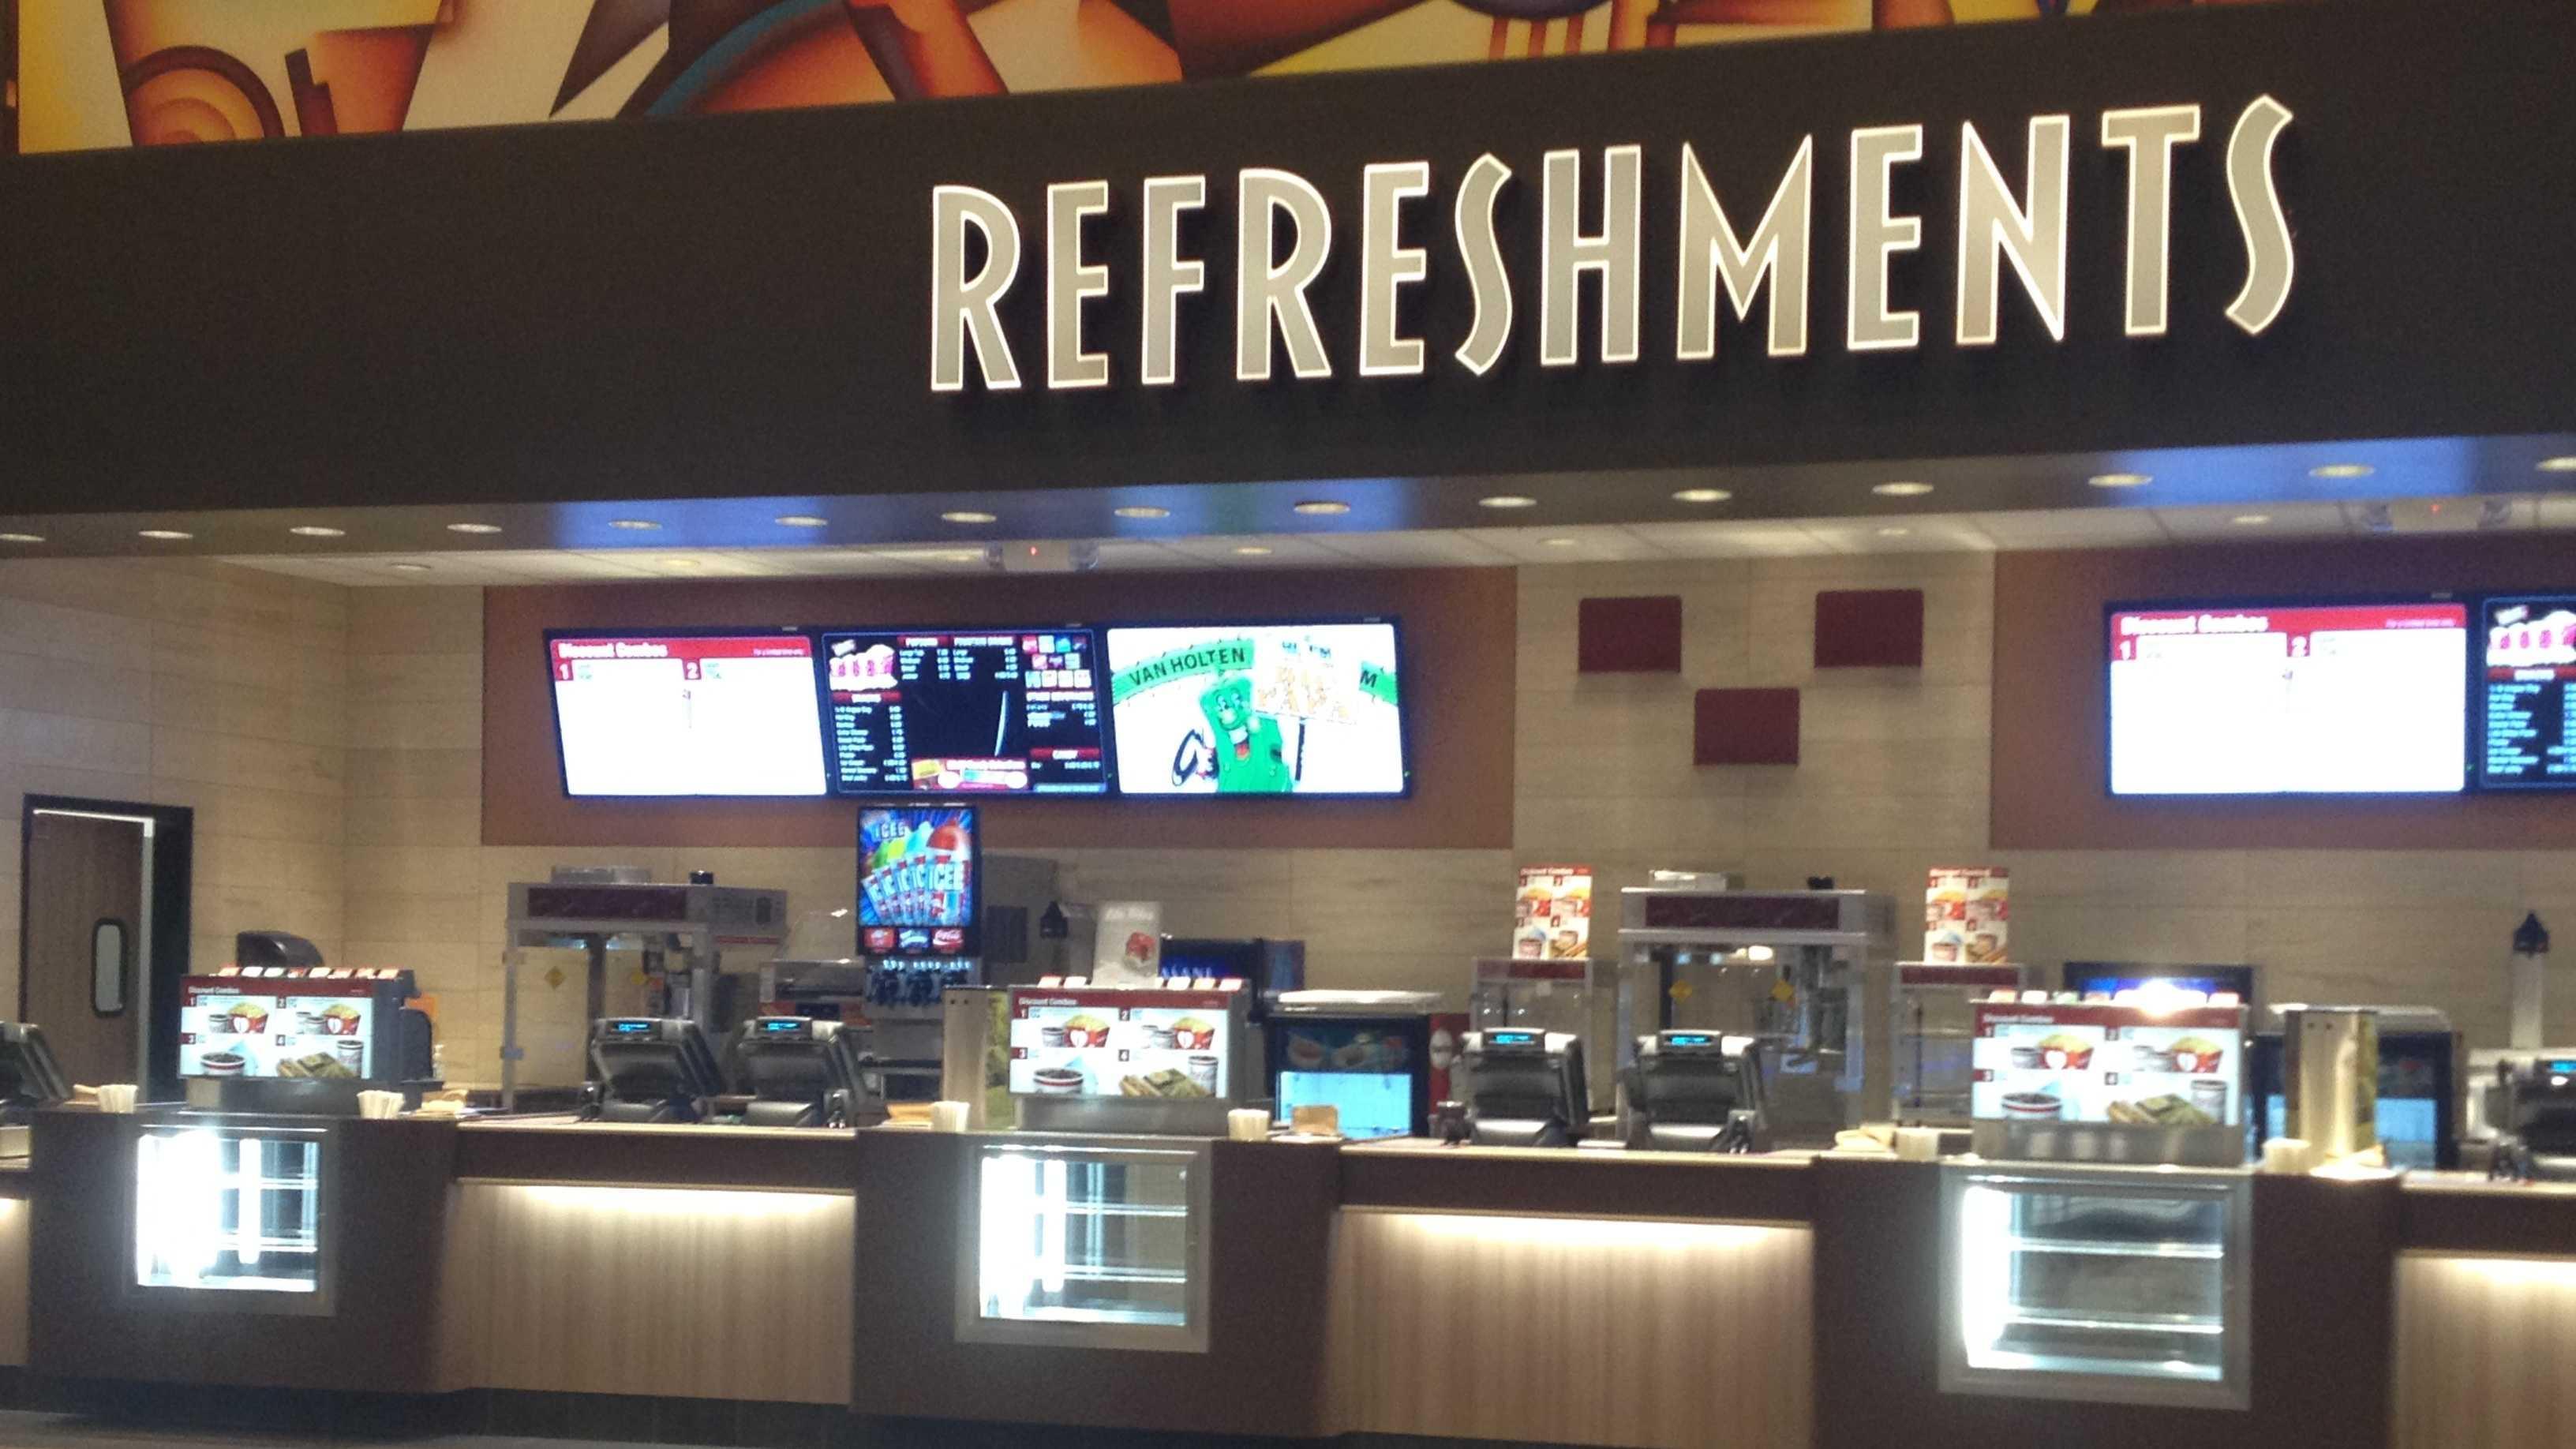 Movie theater refreshments